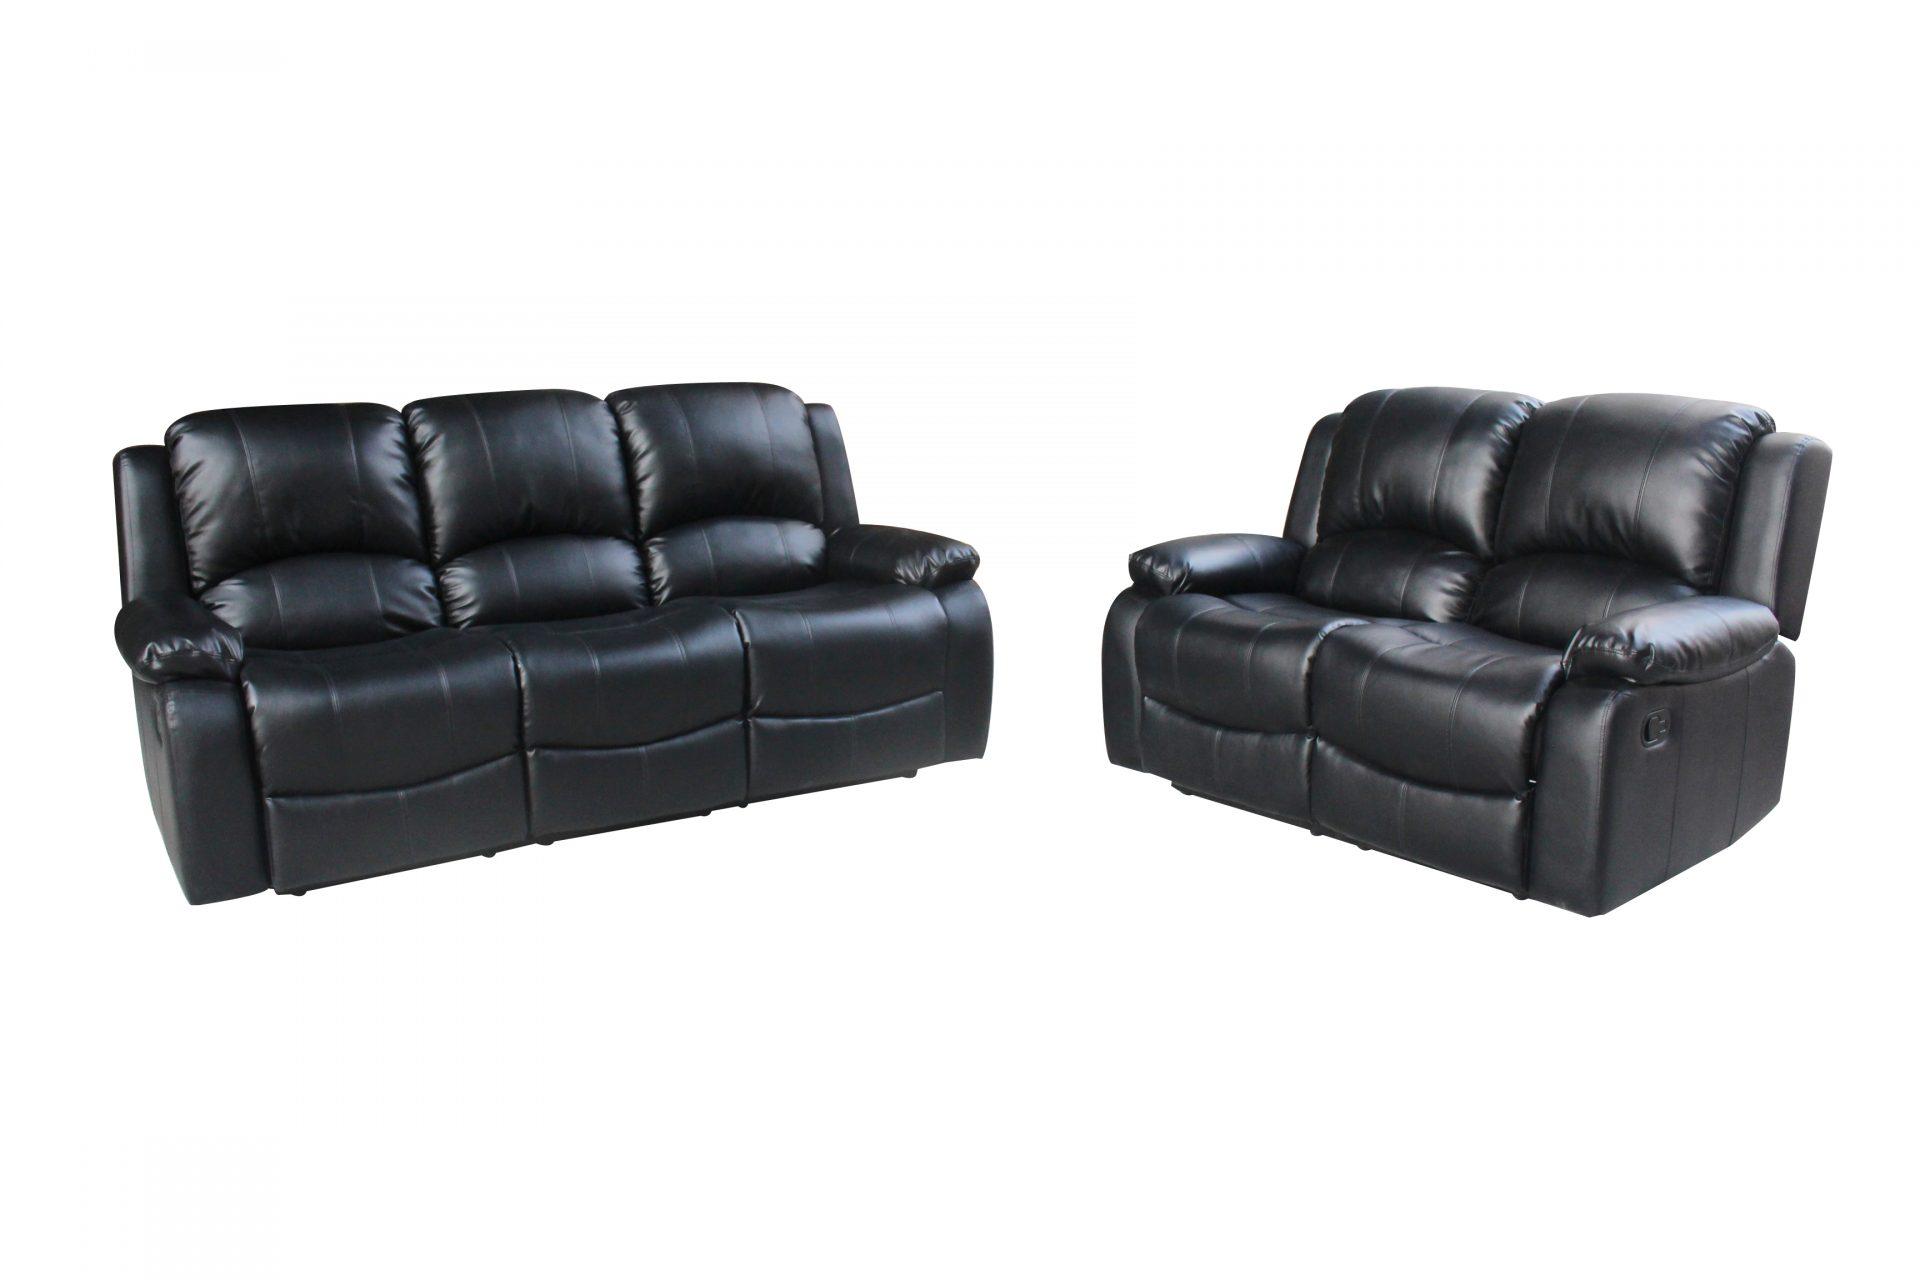 Leather Sofas Rental Goods